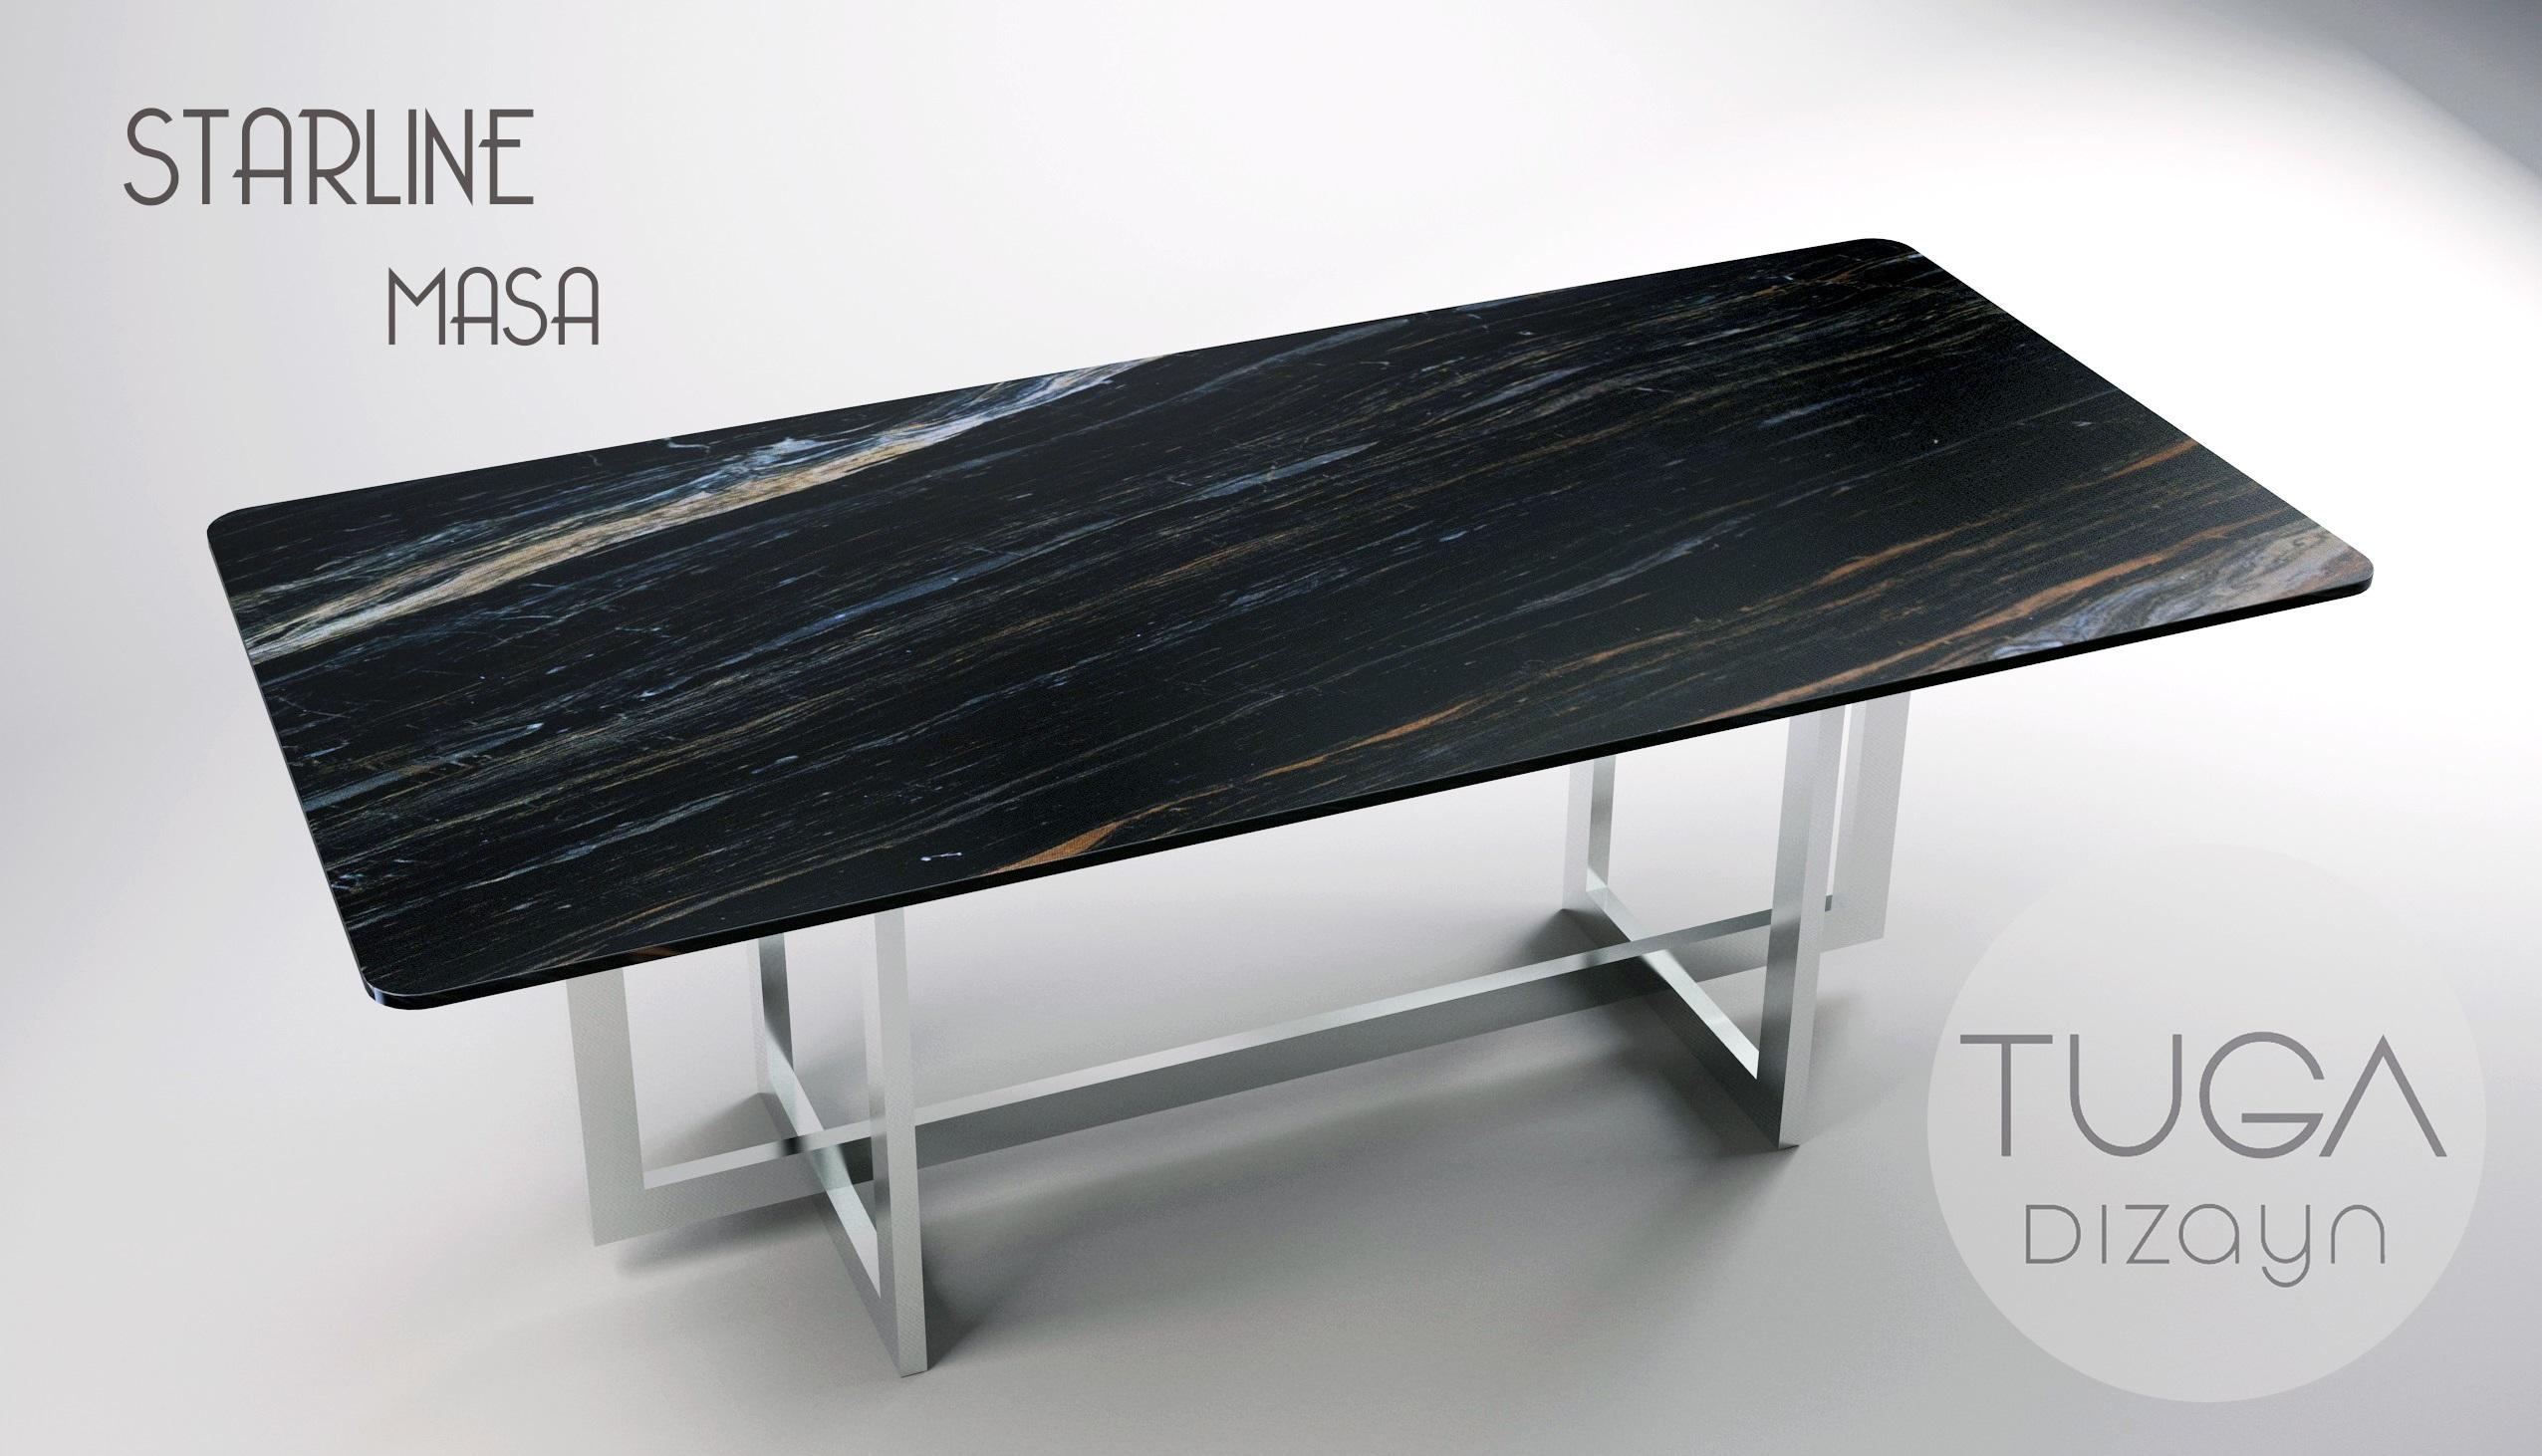 Starlıne Masa